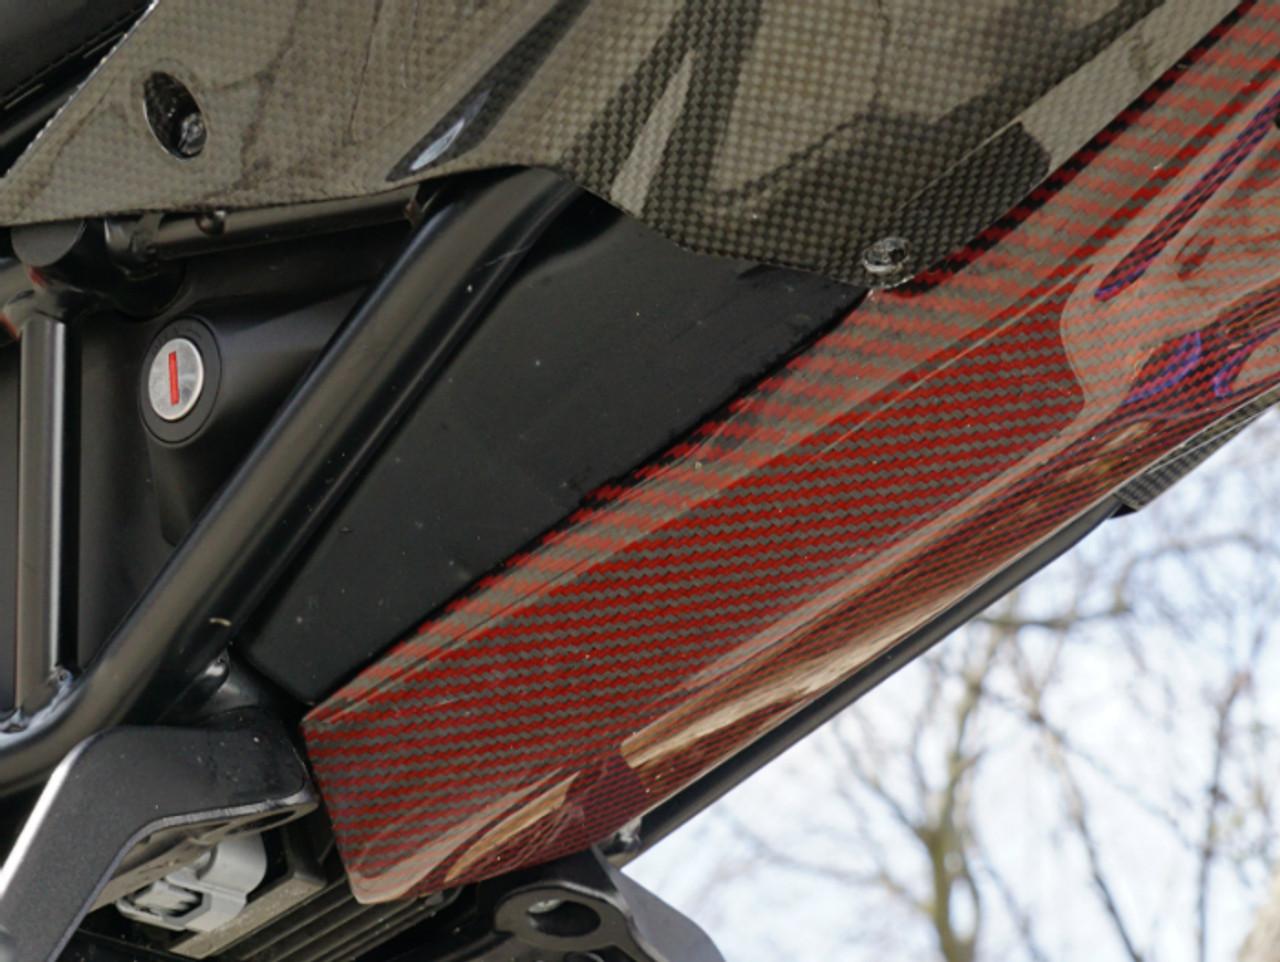 Under Tail in Glossy Twill Weave Black & Orange 100% Carbon Fiber for KTM 1290 Super Duke R